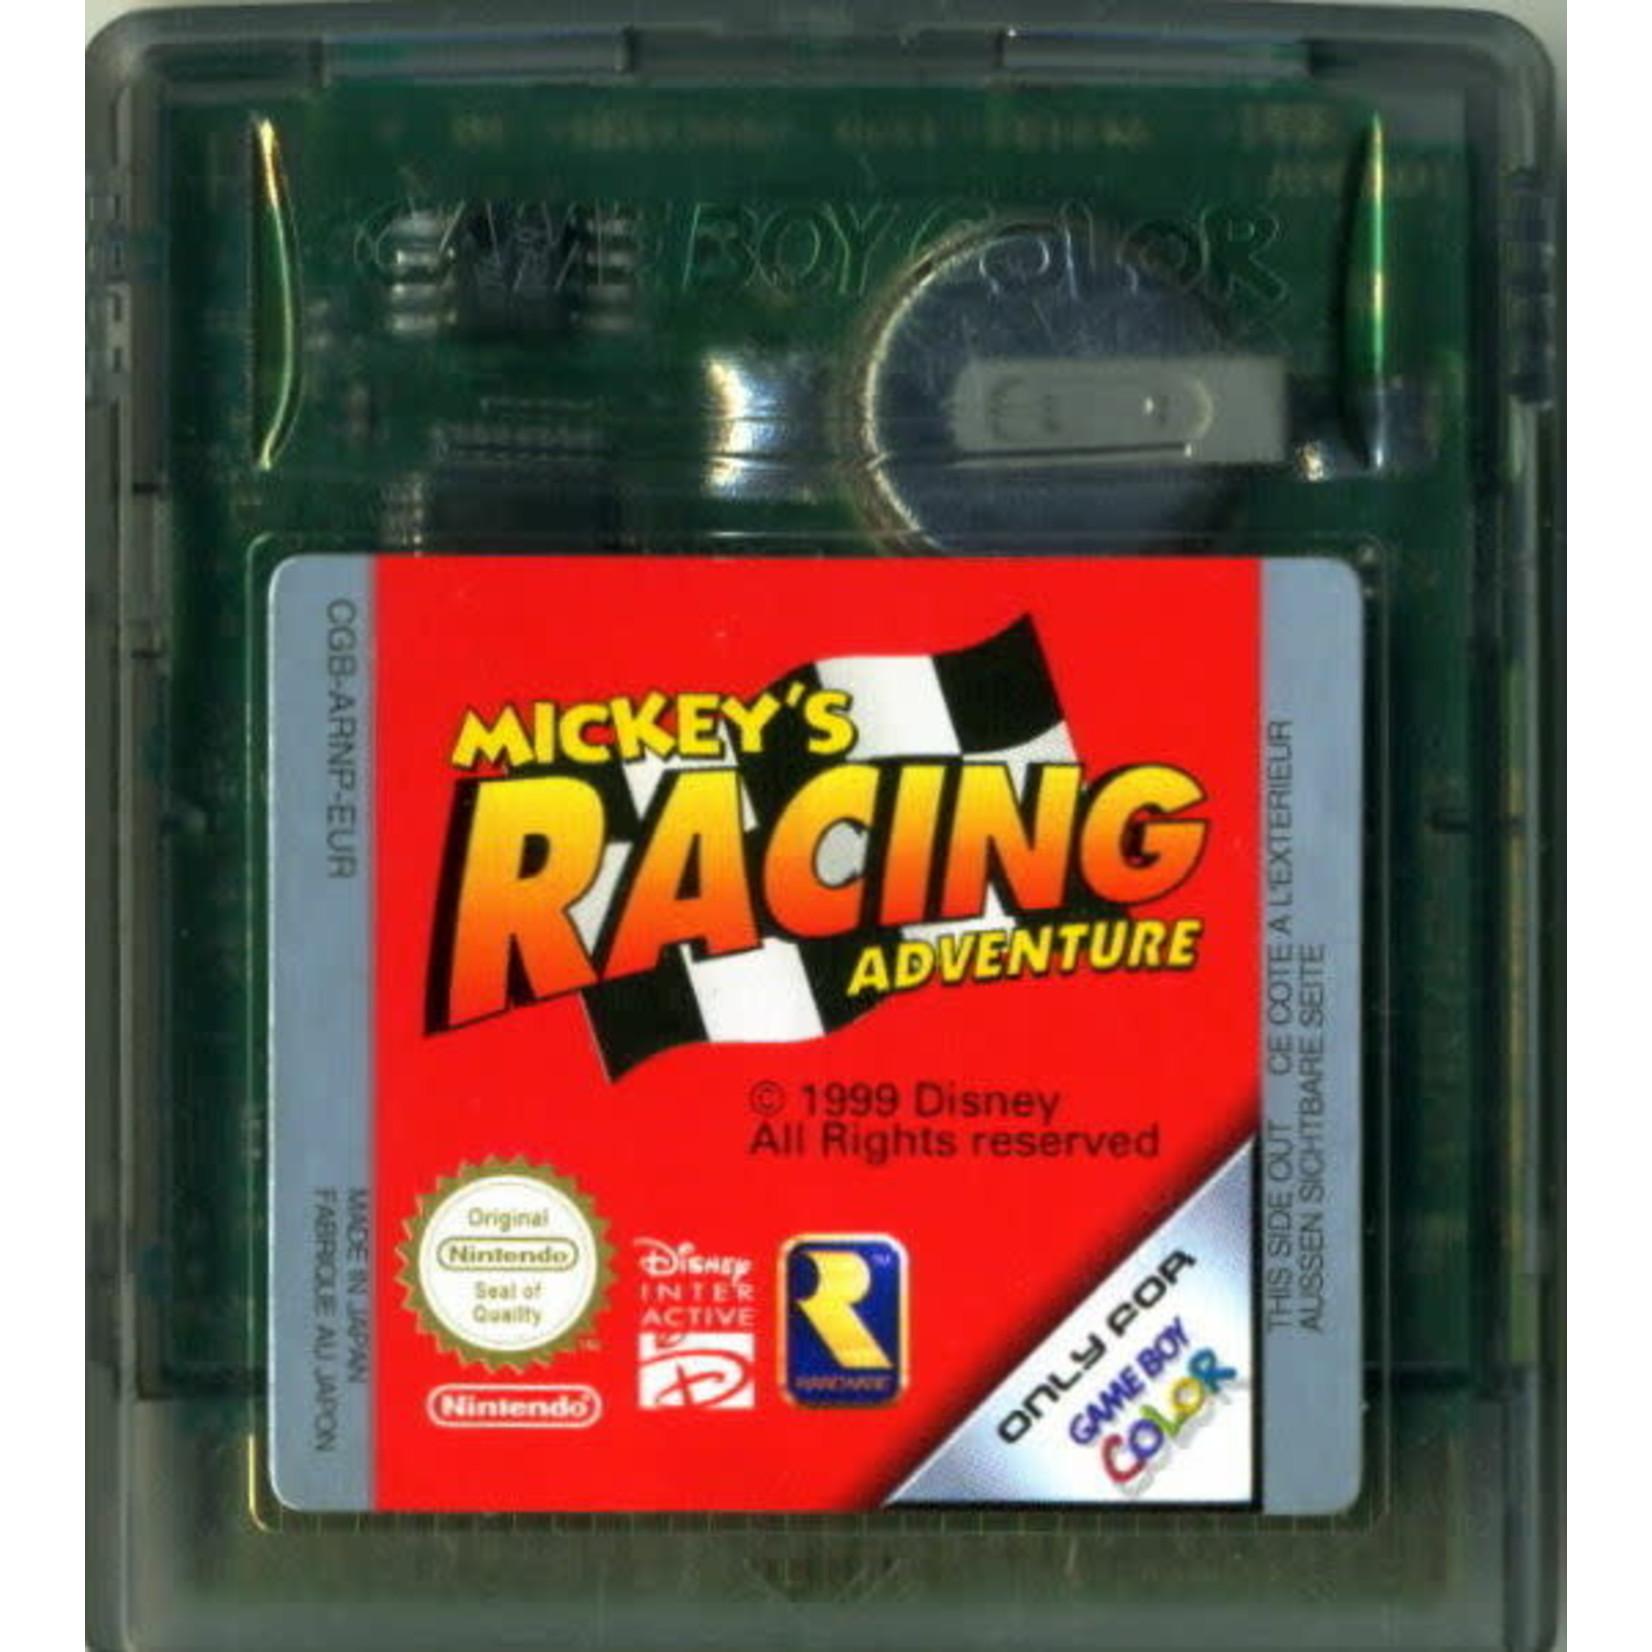 gbcu-Mickey's Racing Adventure (cart)